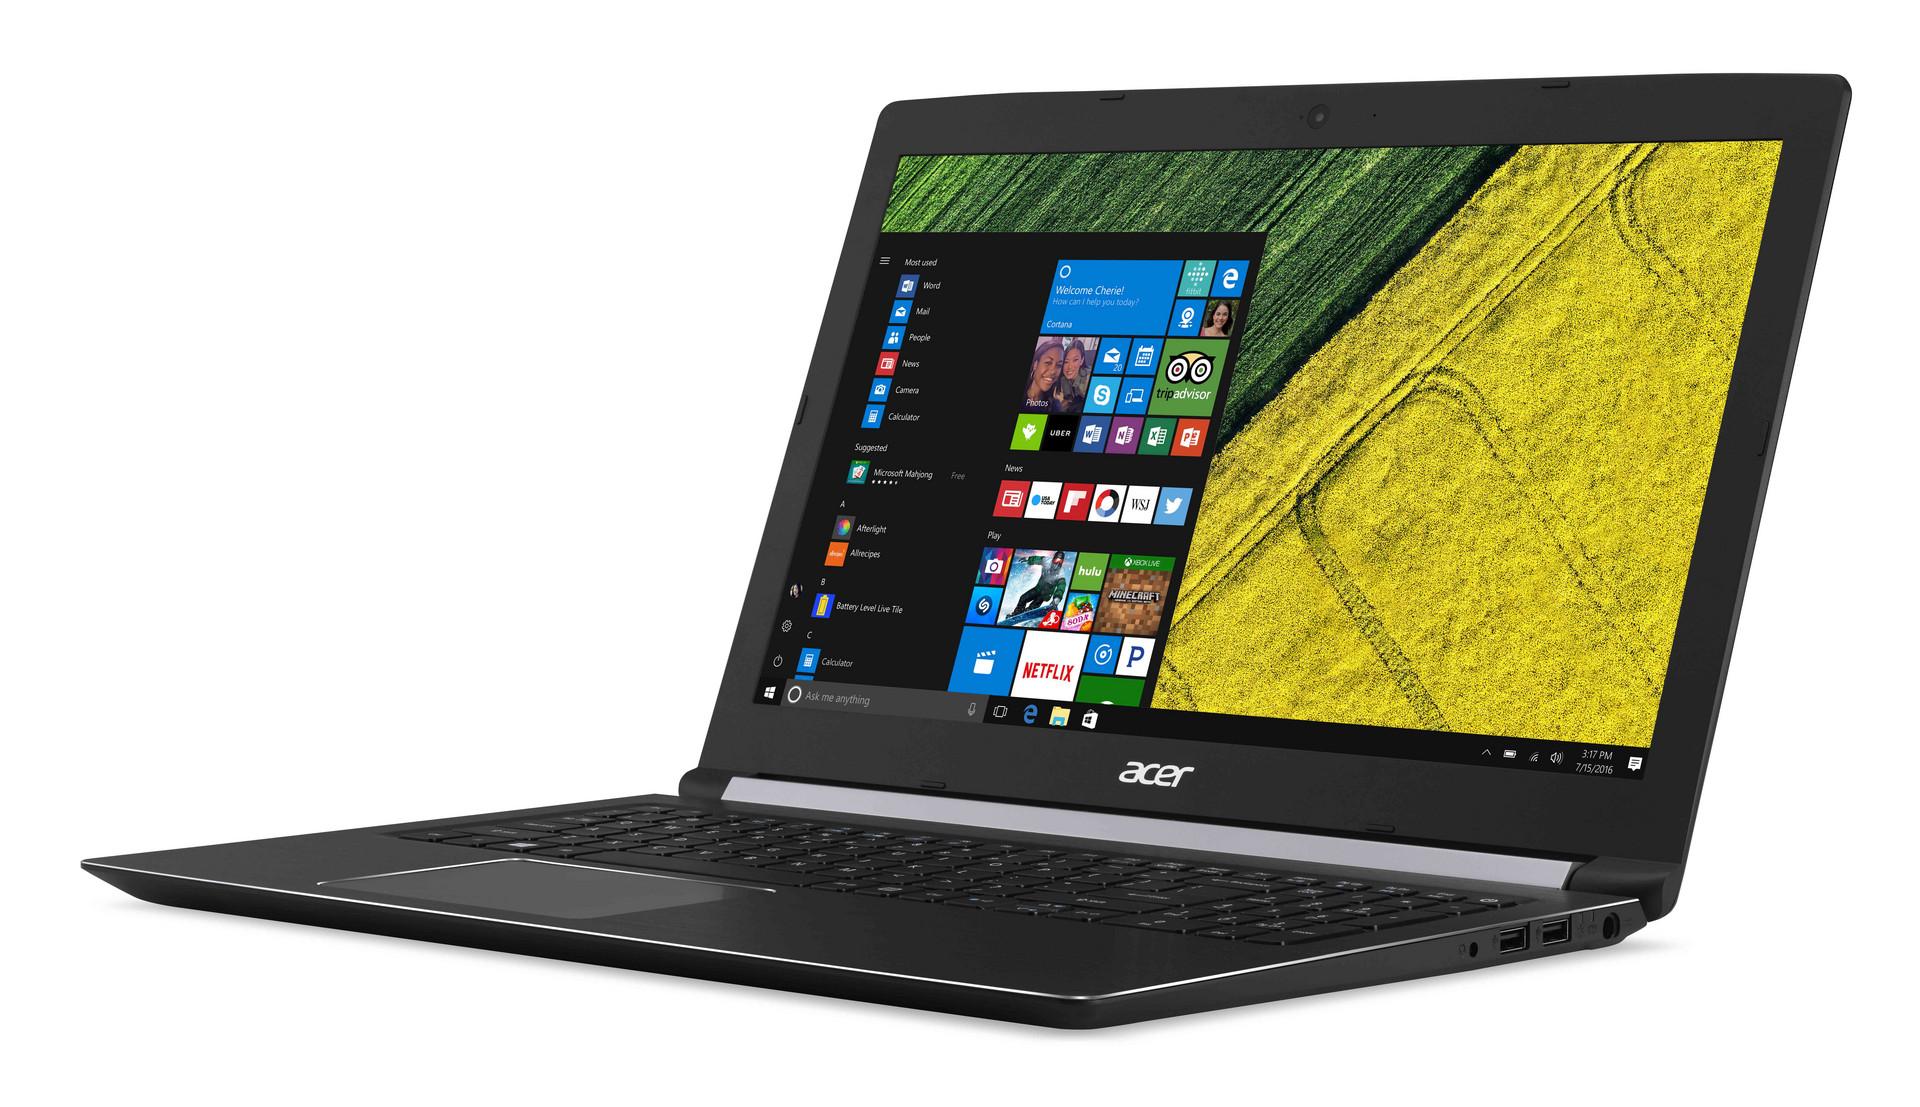 Acer Aspire_7 600